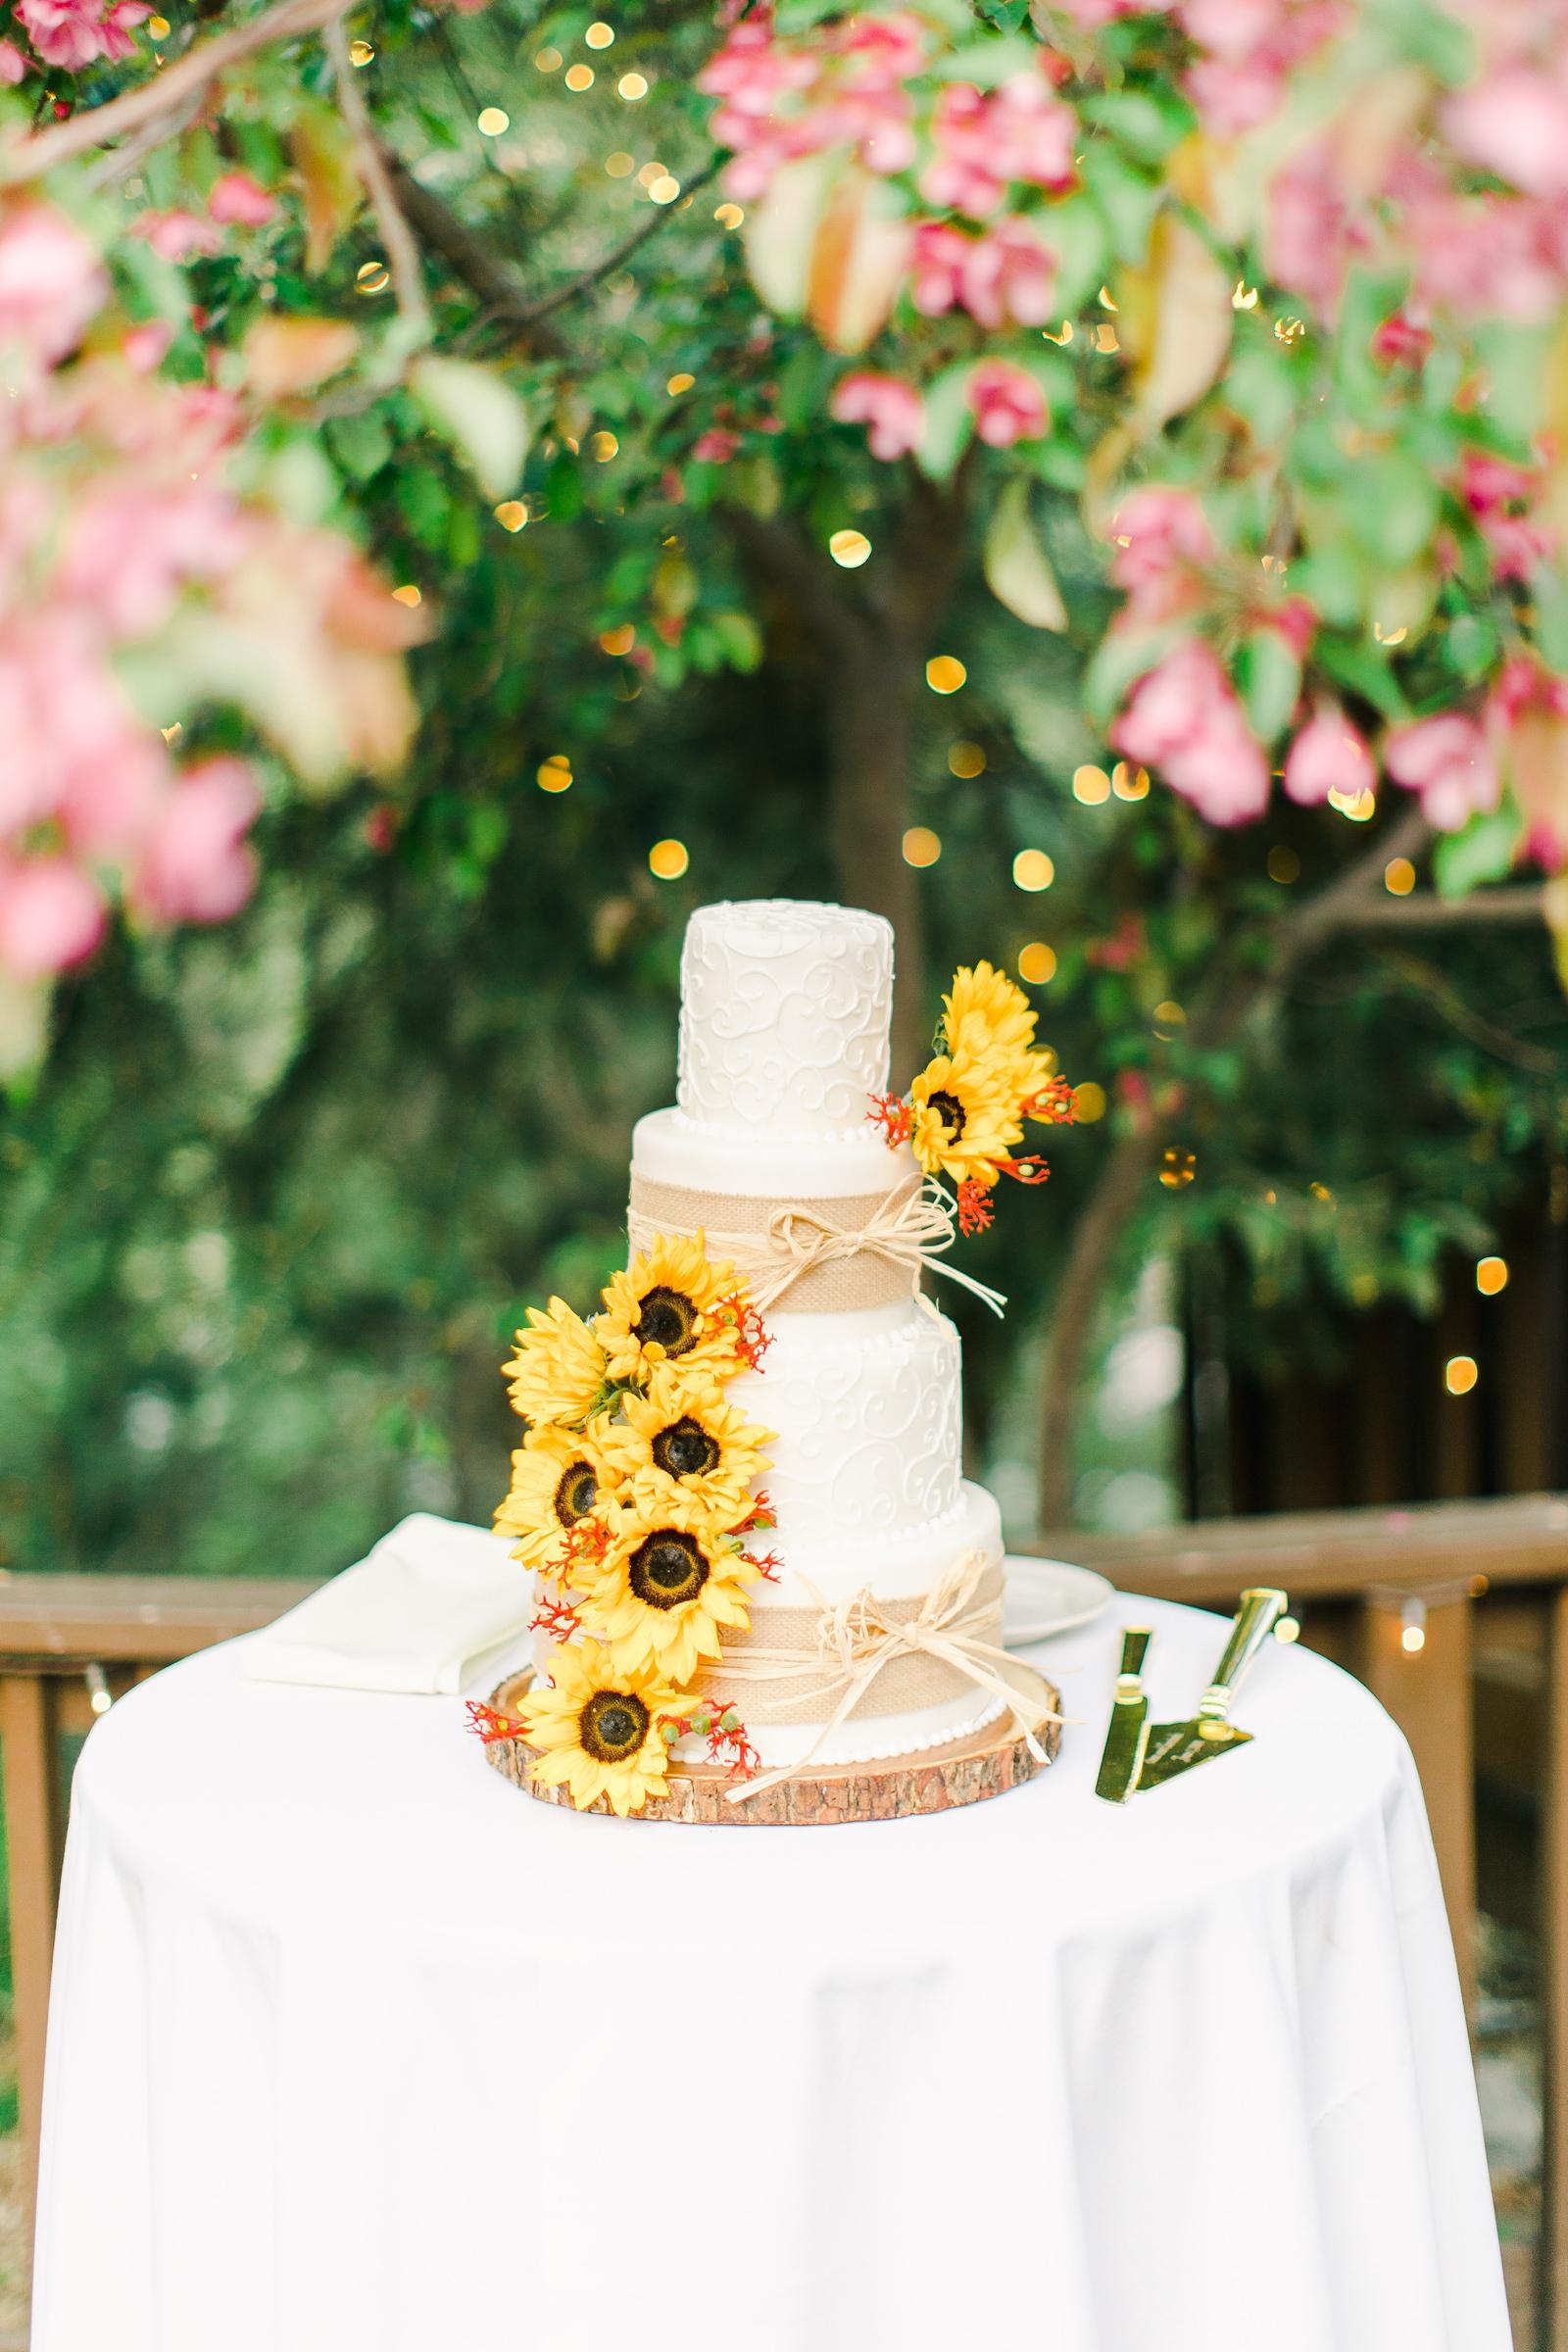 Millcreek Inn Summer Wedding, Utah wedding photography Millcreek Canyon, Salt Lake City, three tier white buttercream wedding cake with sunflowers